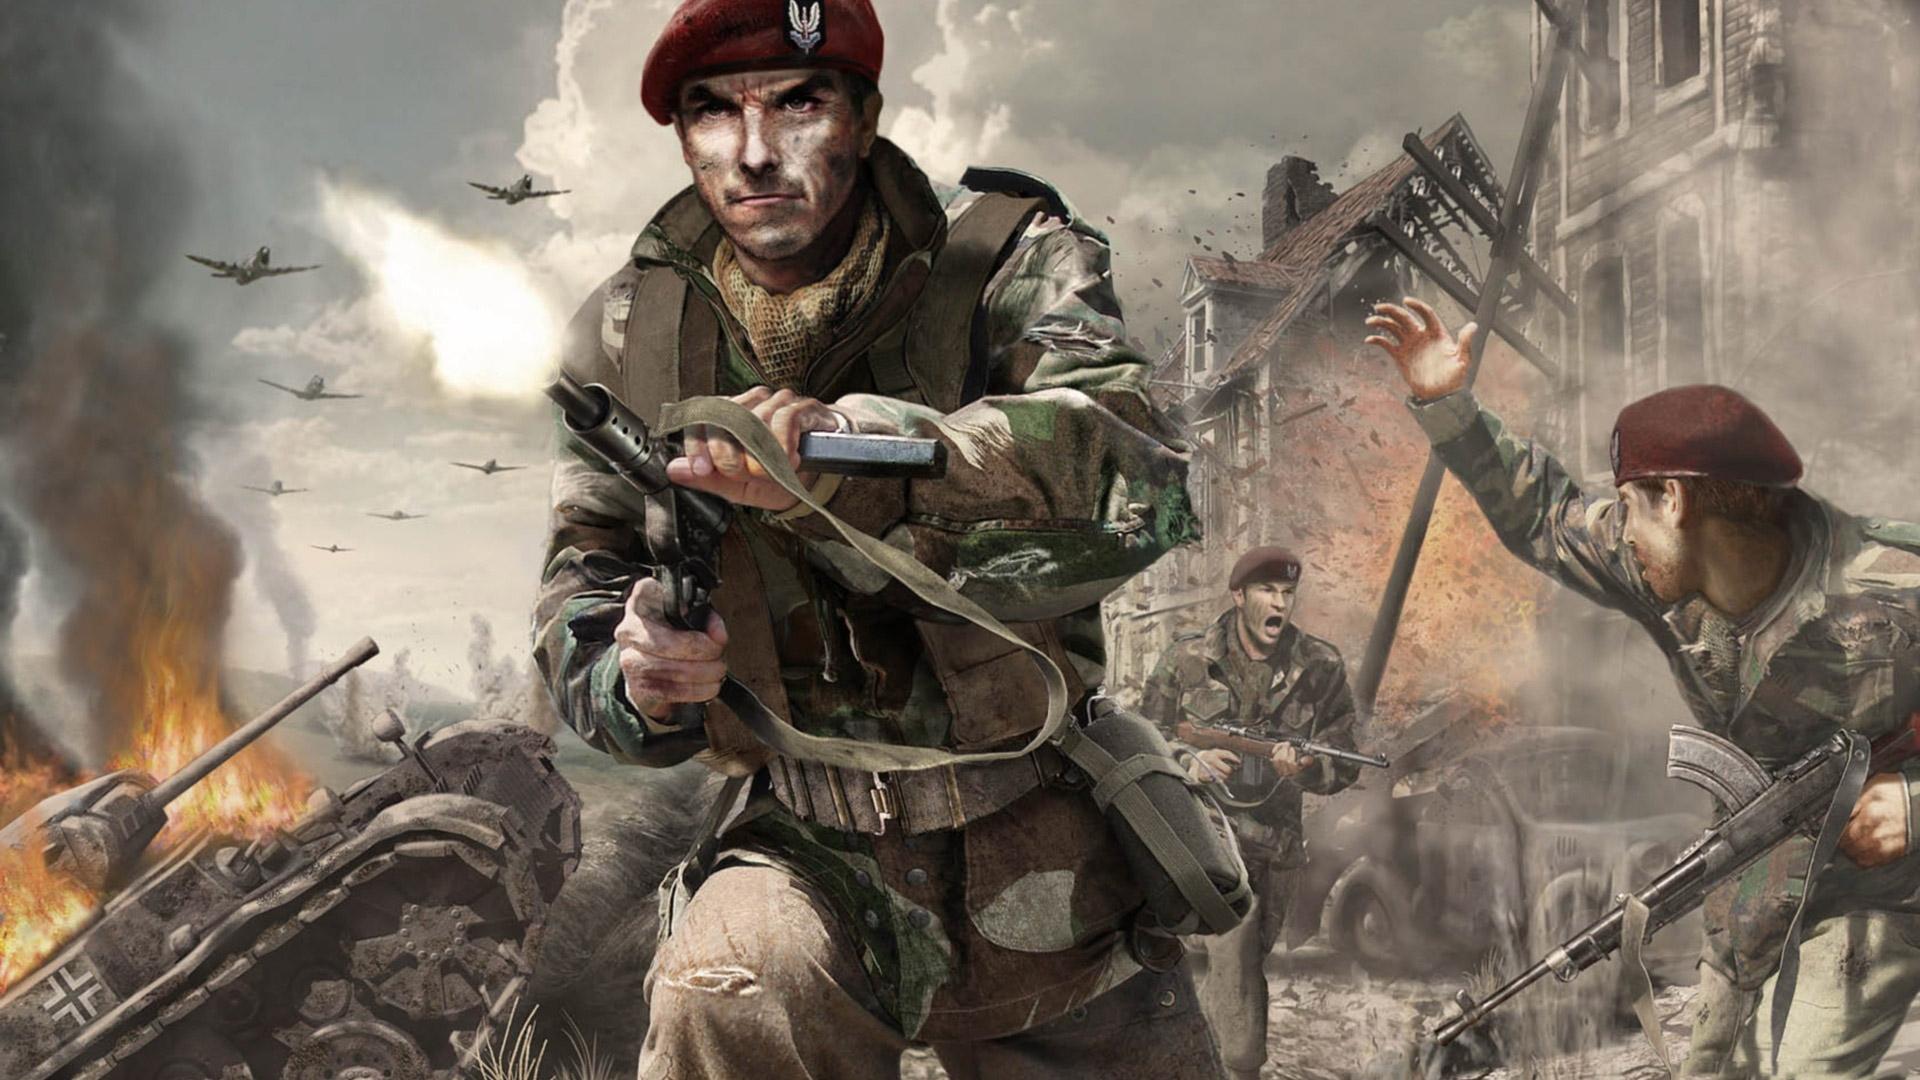 Call of Duty 3 Wallpaper in 1920x1080